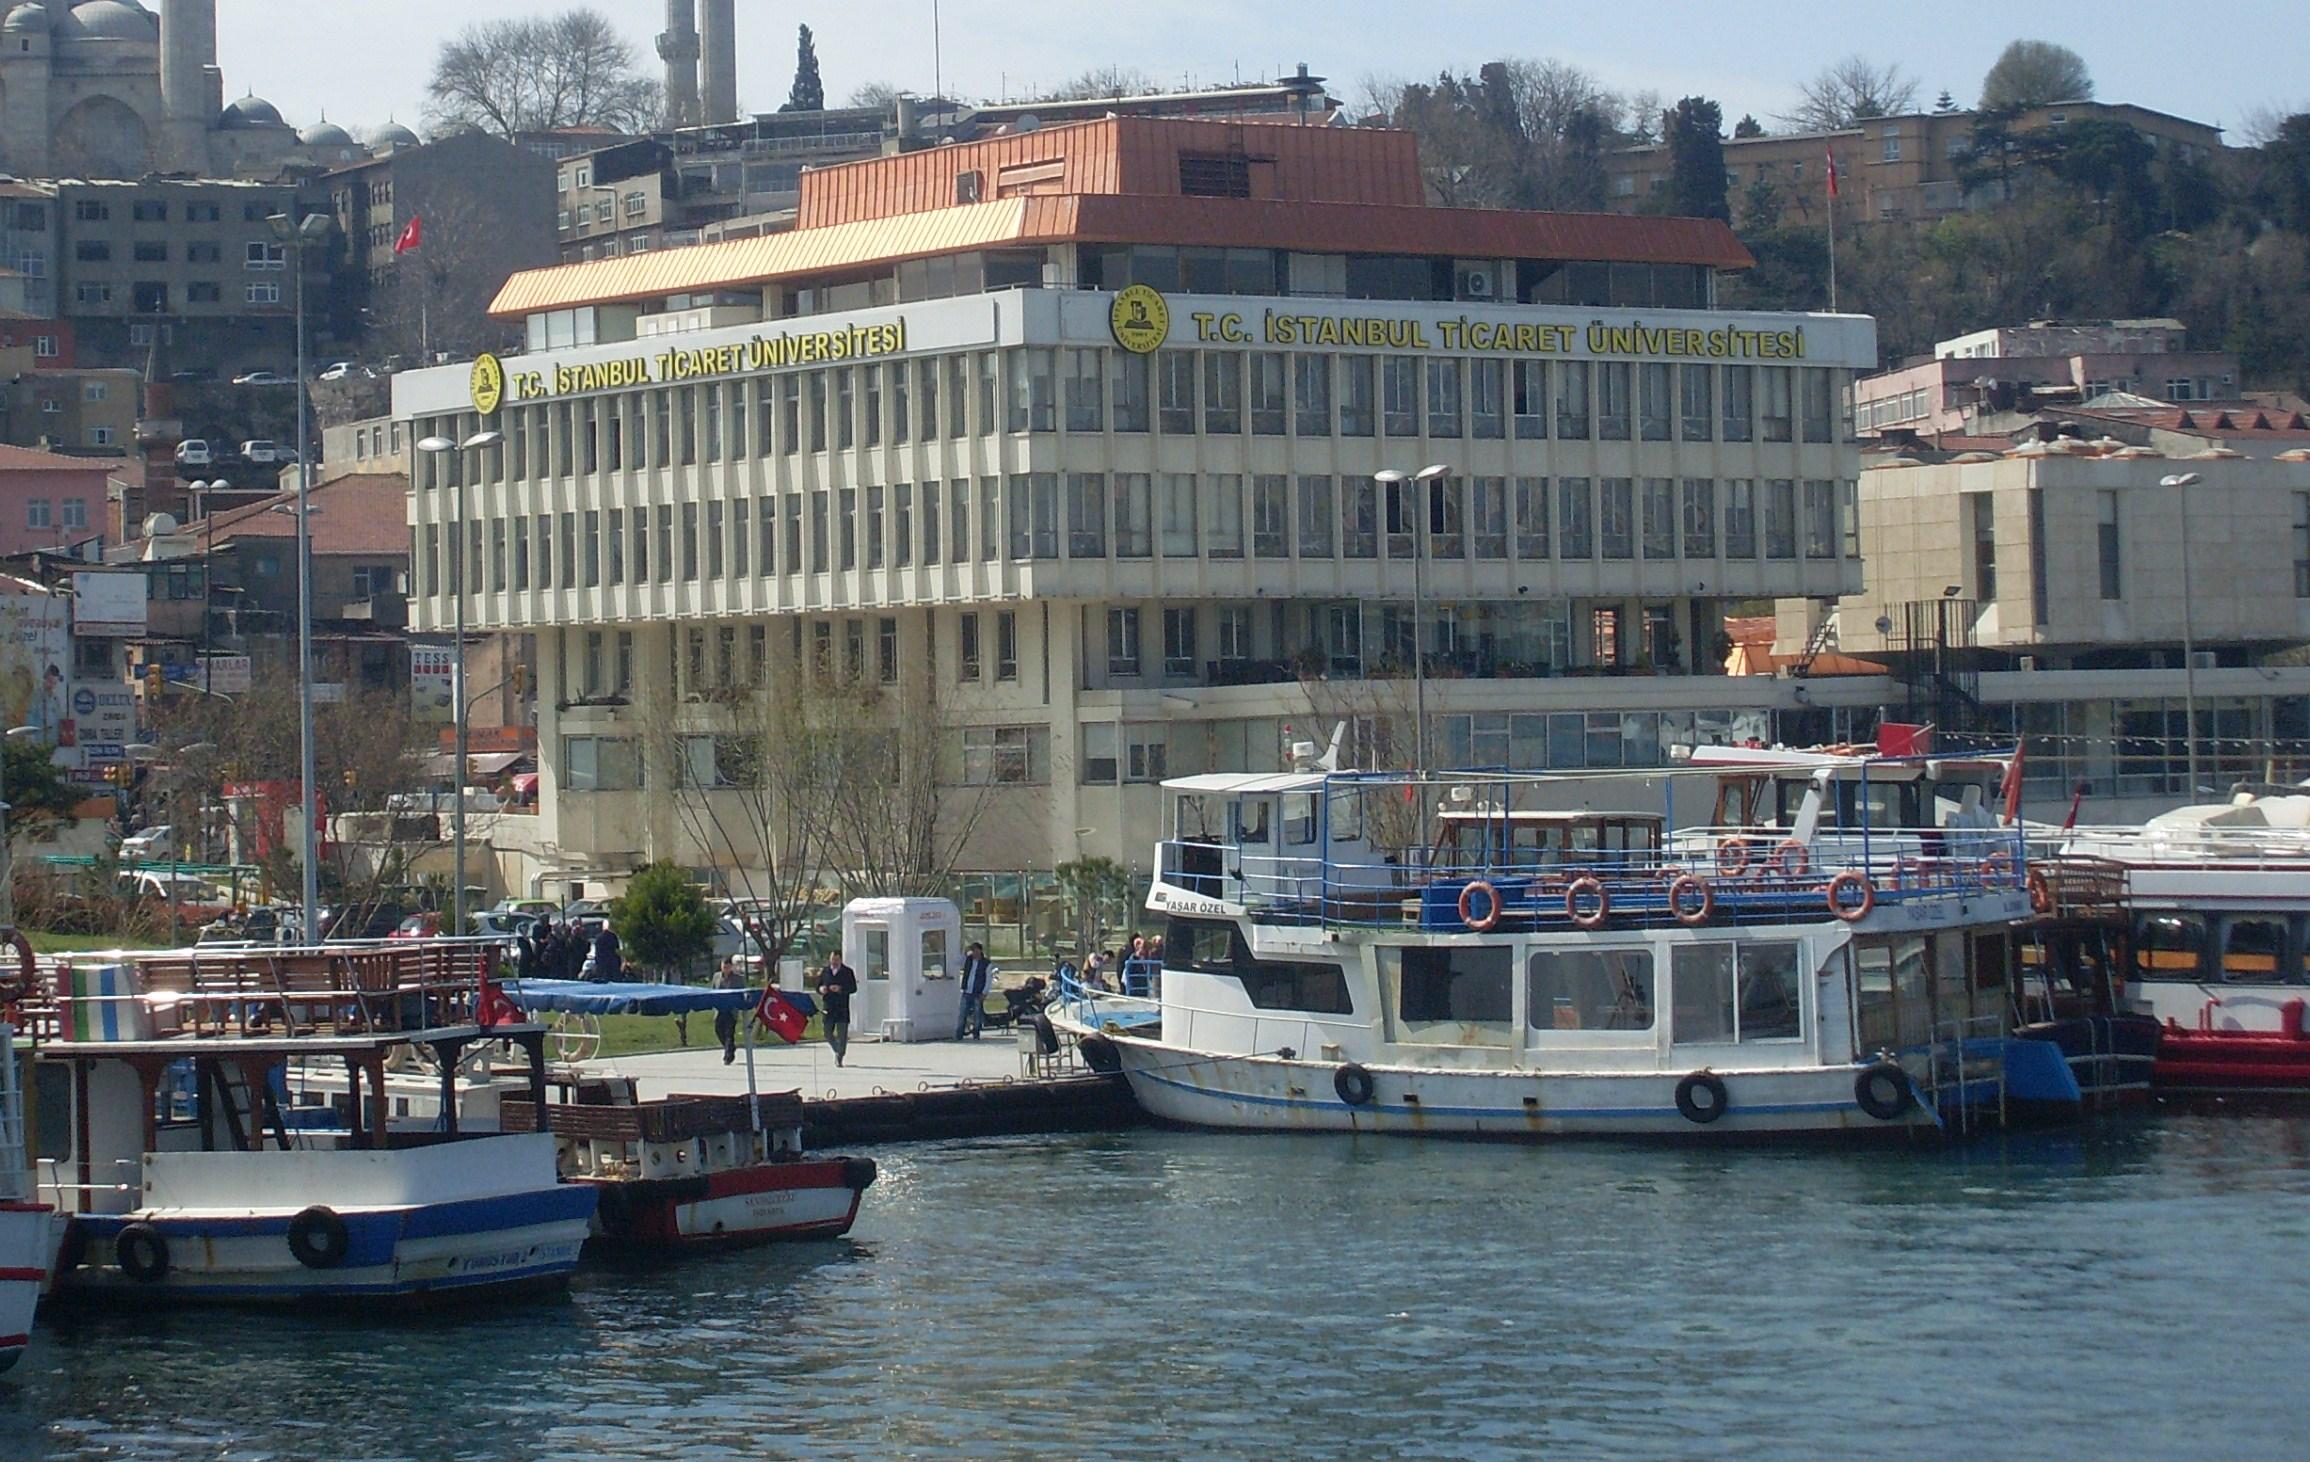 Istanbul Commerce University Toefl Center